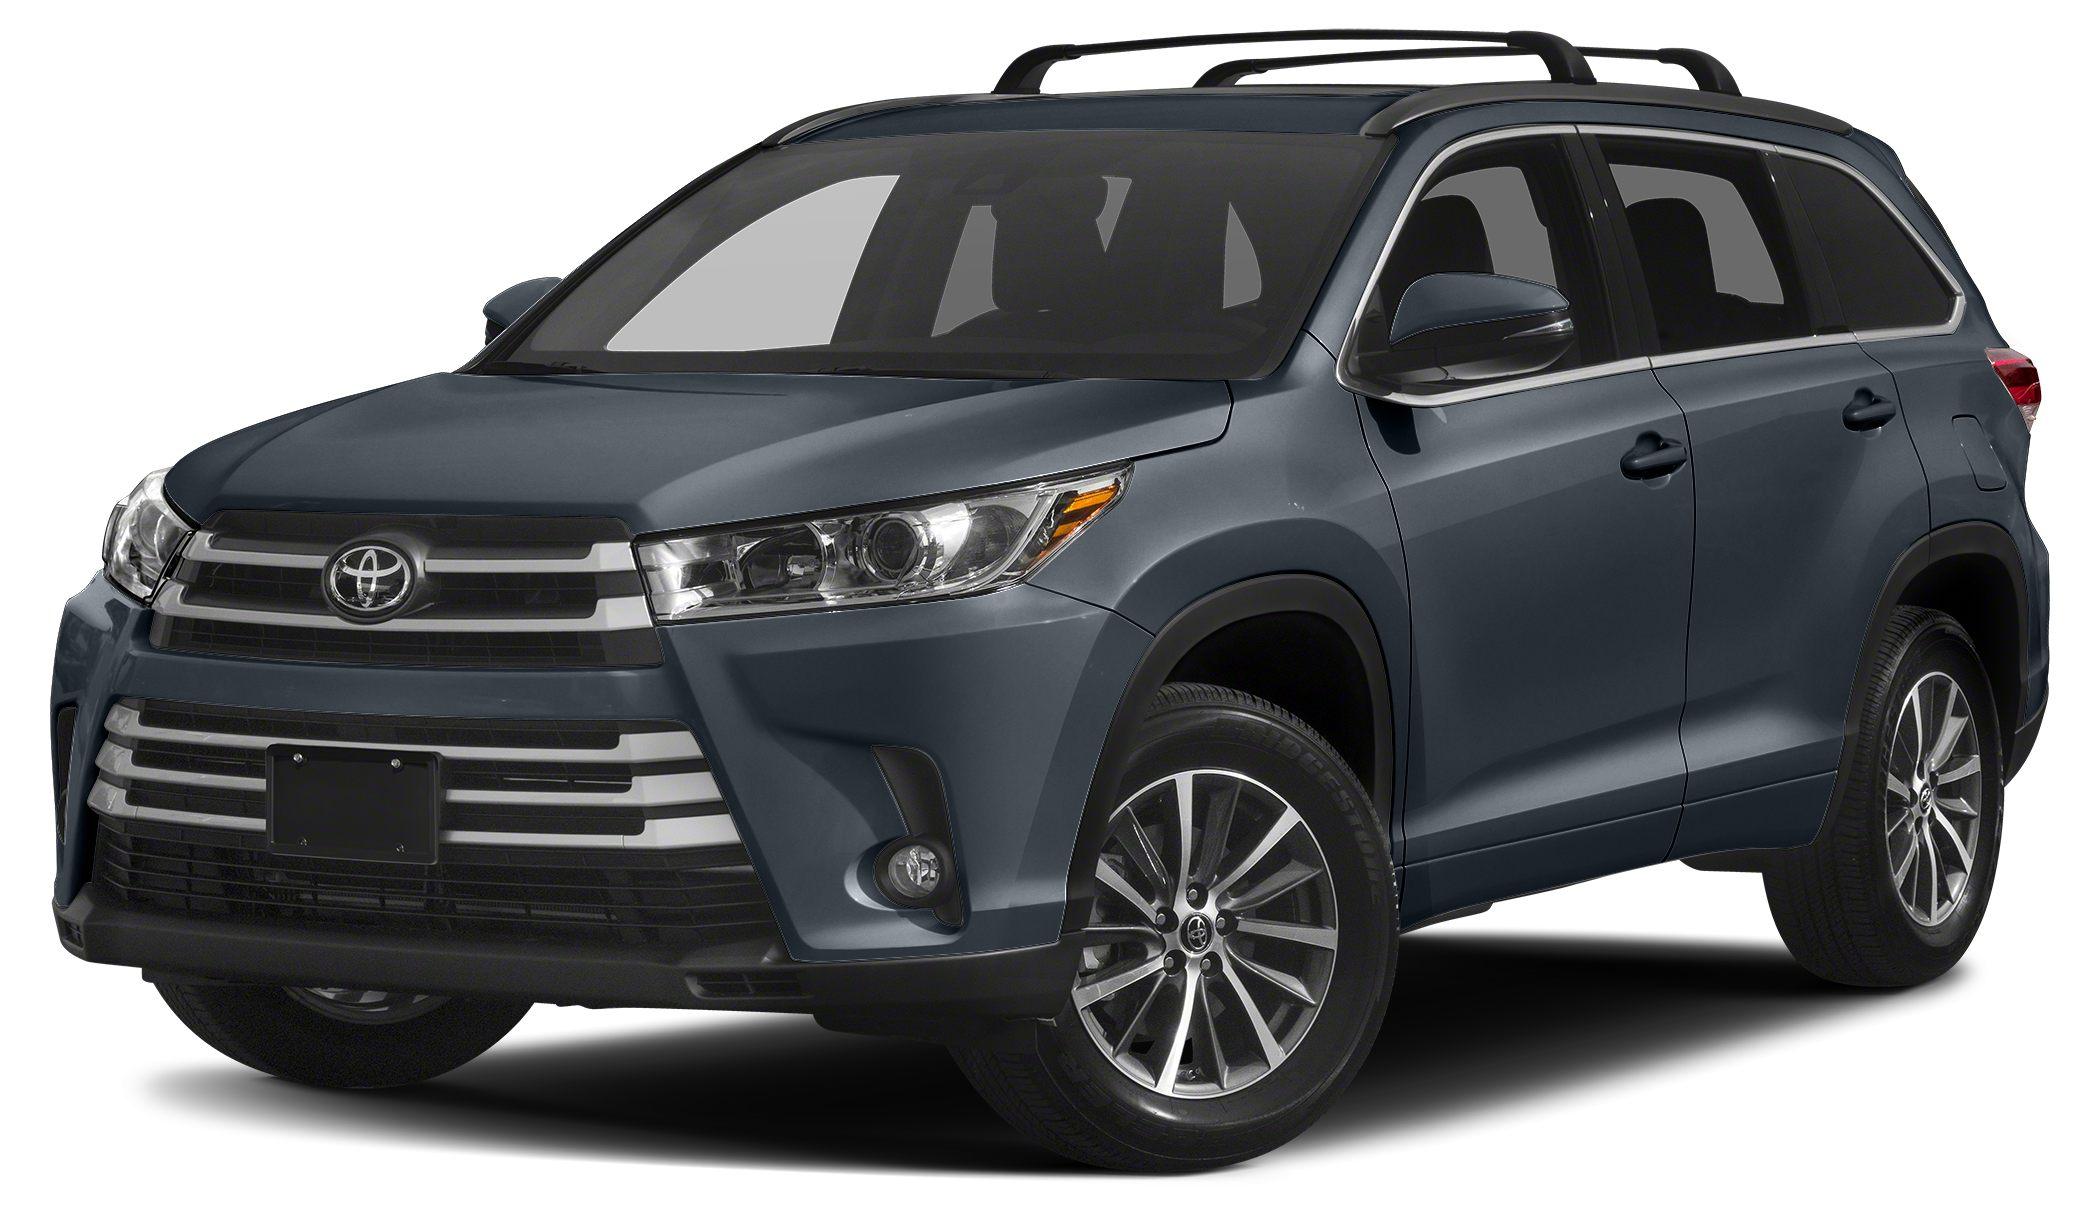 2017 Toyota Highlander XLE Sunroof Heated Leather Seats Navigation 3rd Row Seat Alloy Wheels